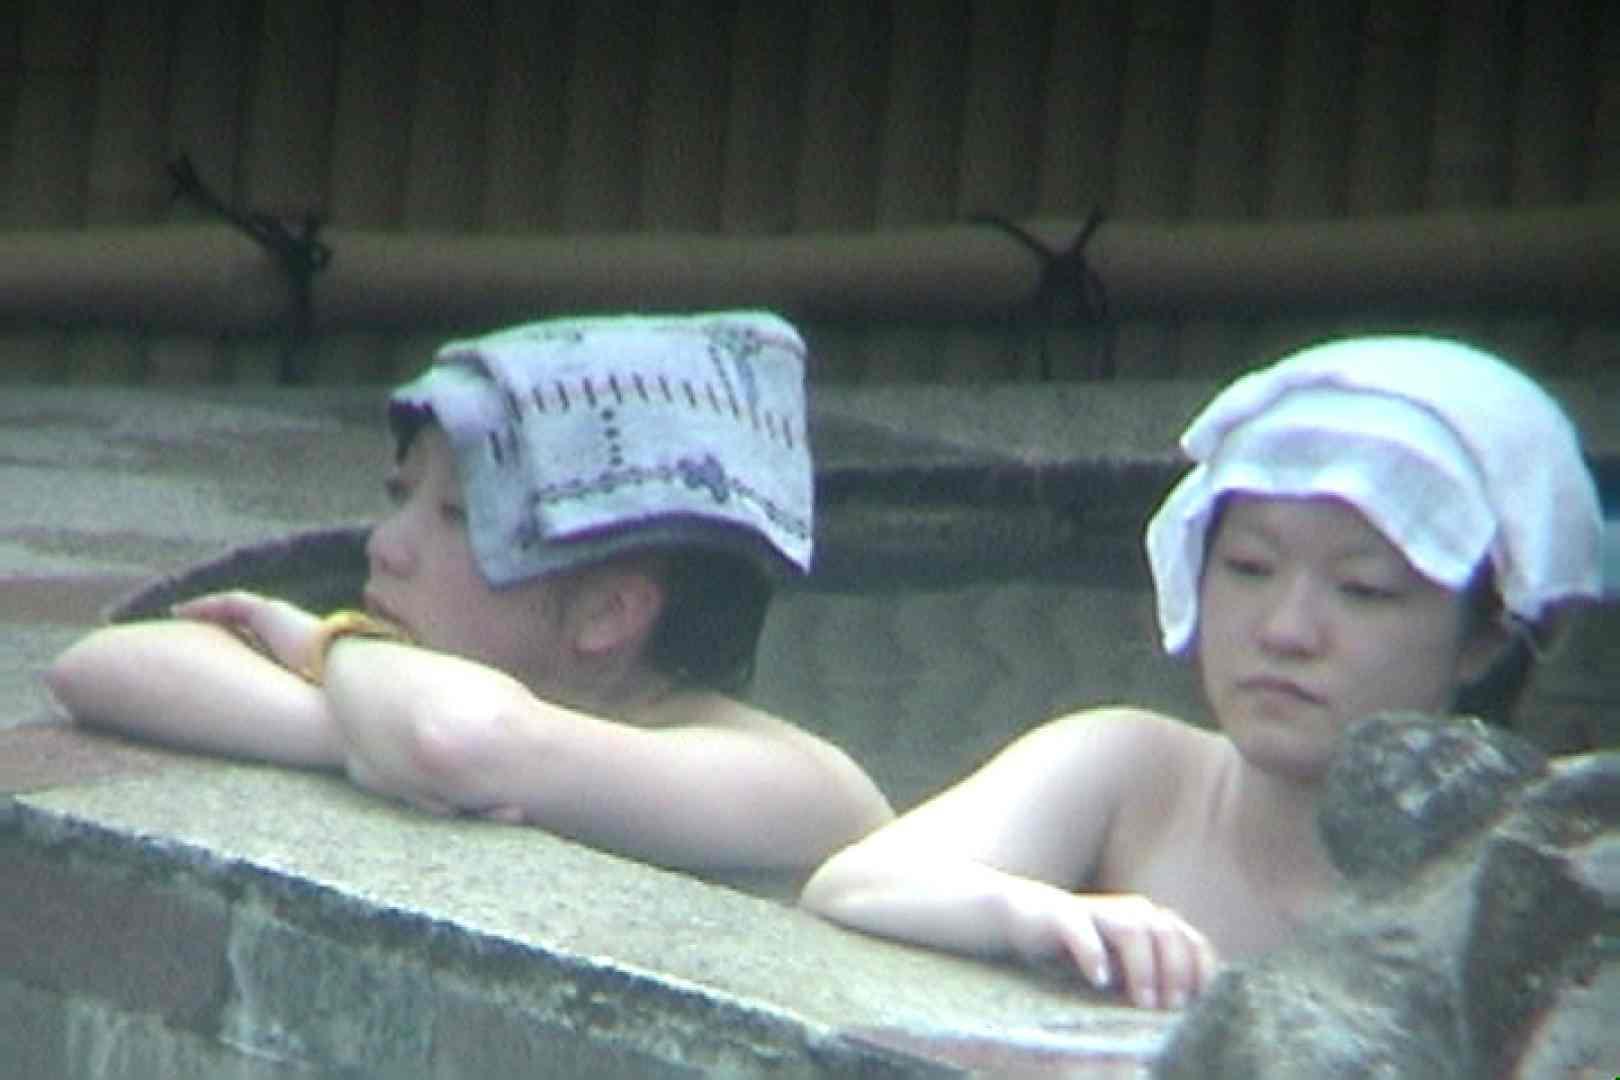 Aquaな露天風呂Vol.104 盗撮シリーズ | 露天風呂編  85PIX 77